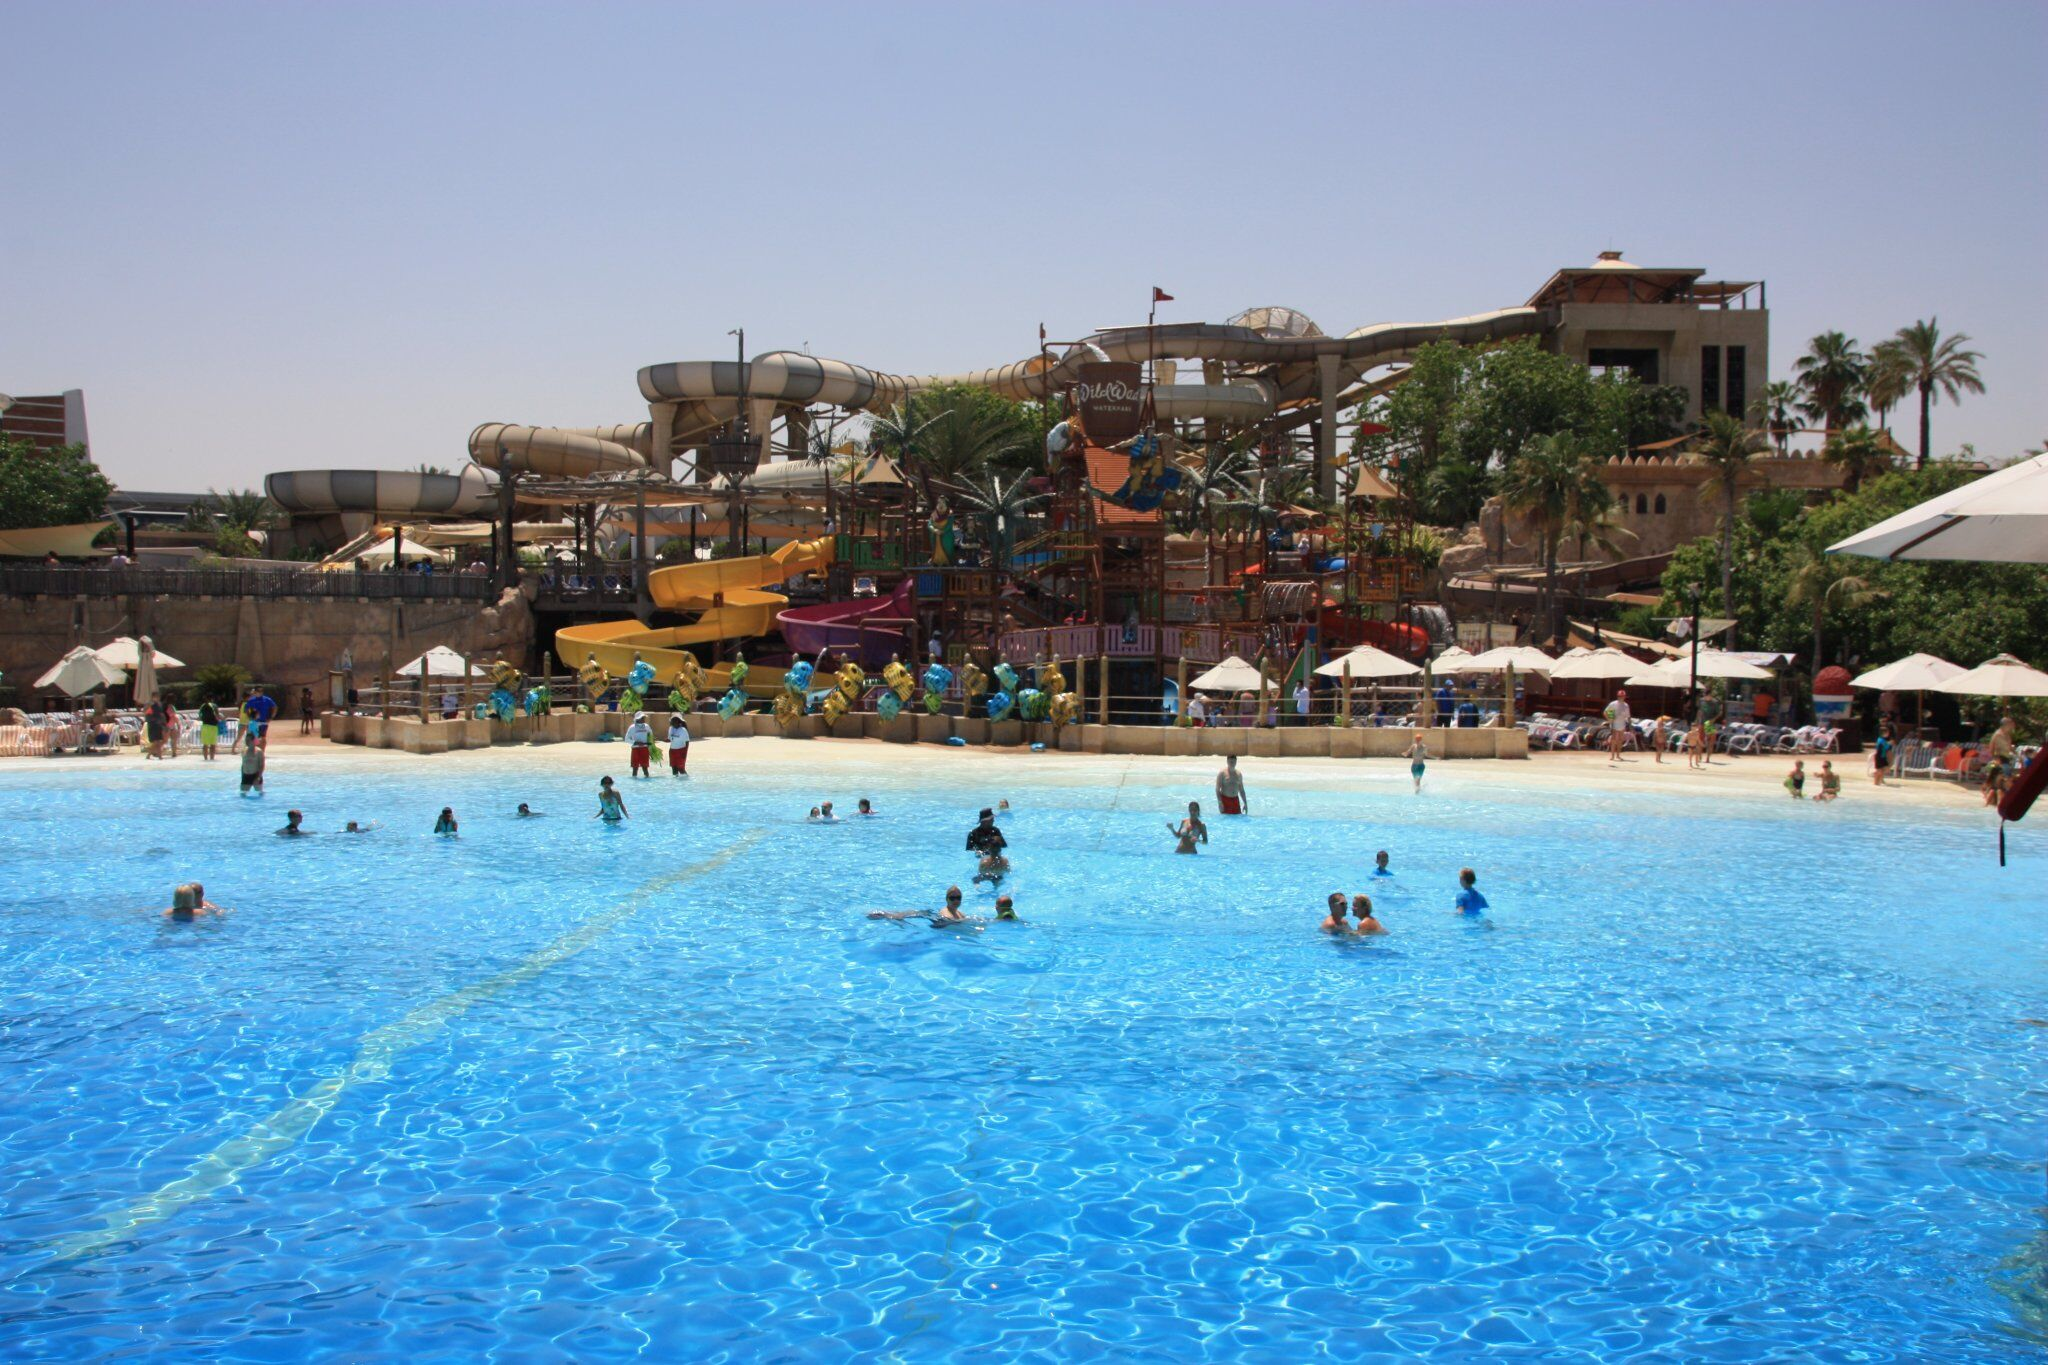 Legoland Water Park Hotel